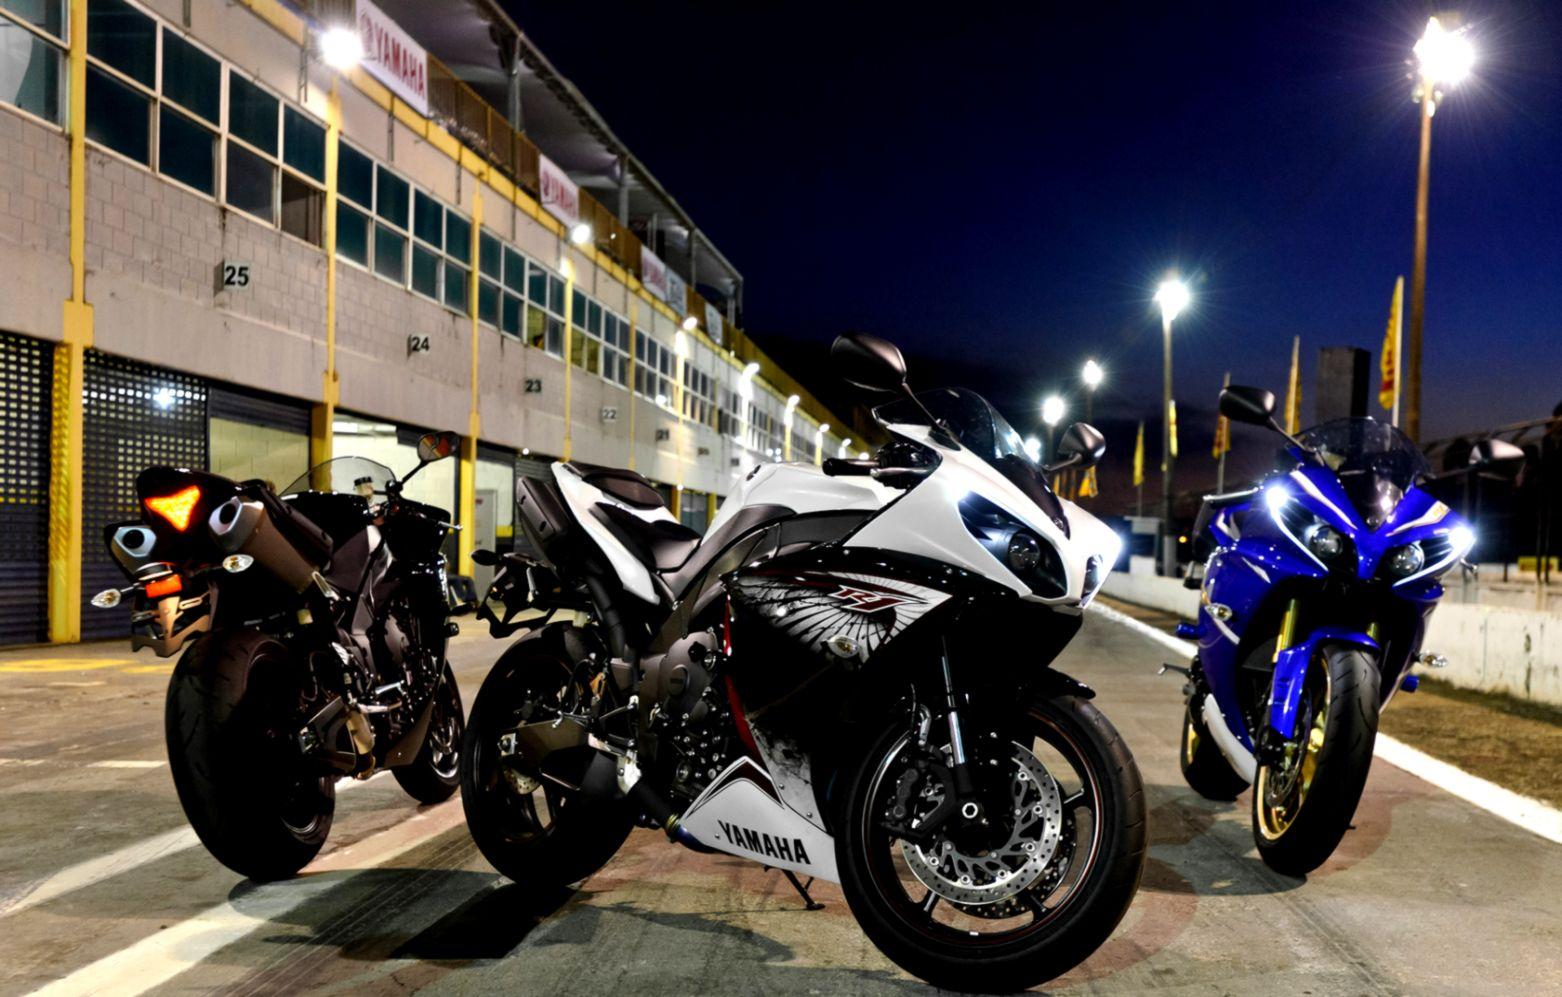 Yamaha R1 Hd Motorcycle Wallpaper Wide Wallpapers